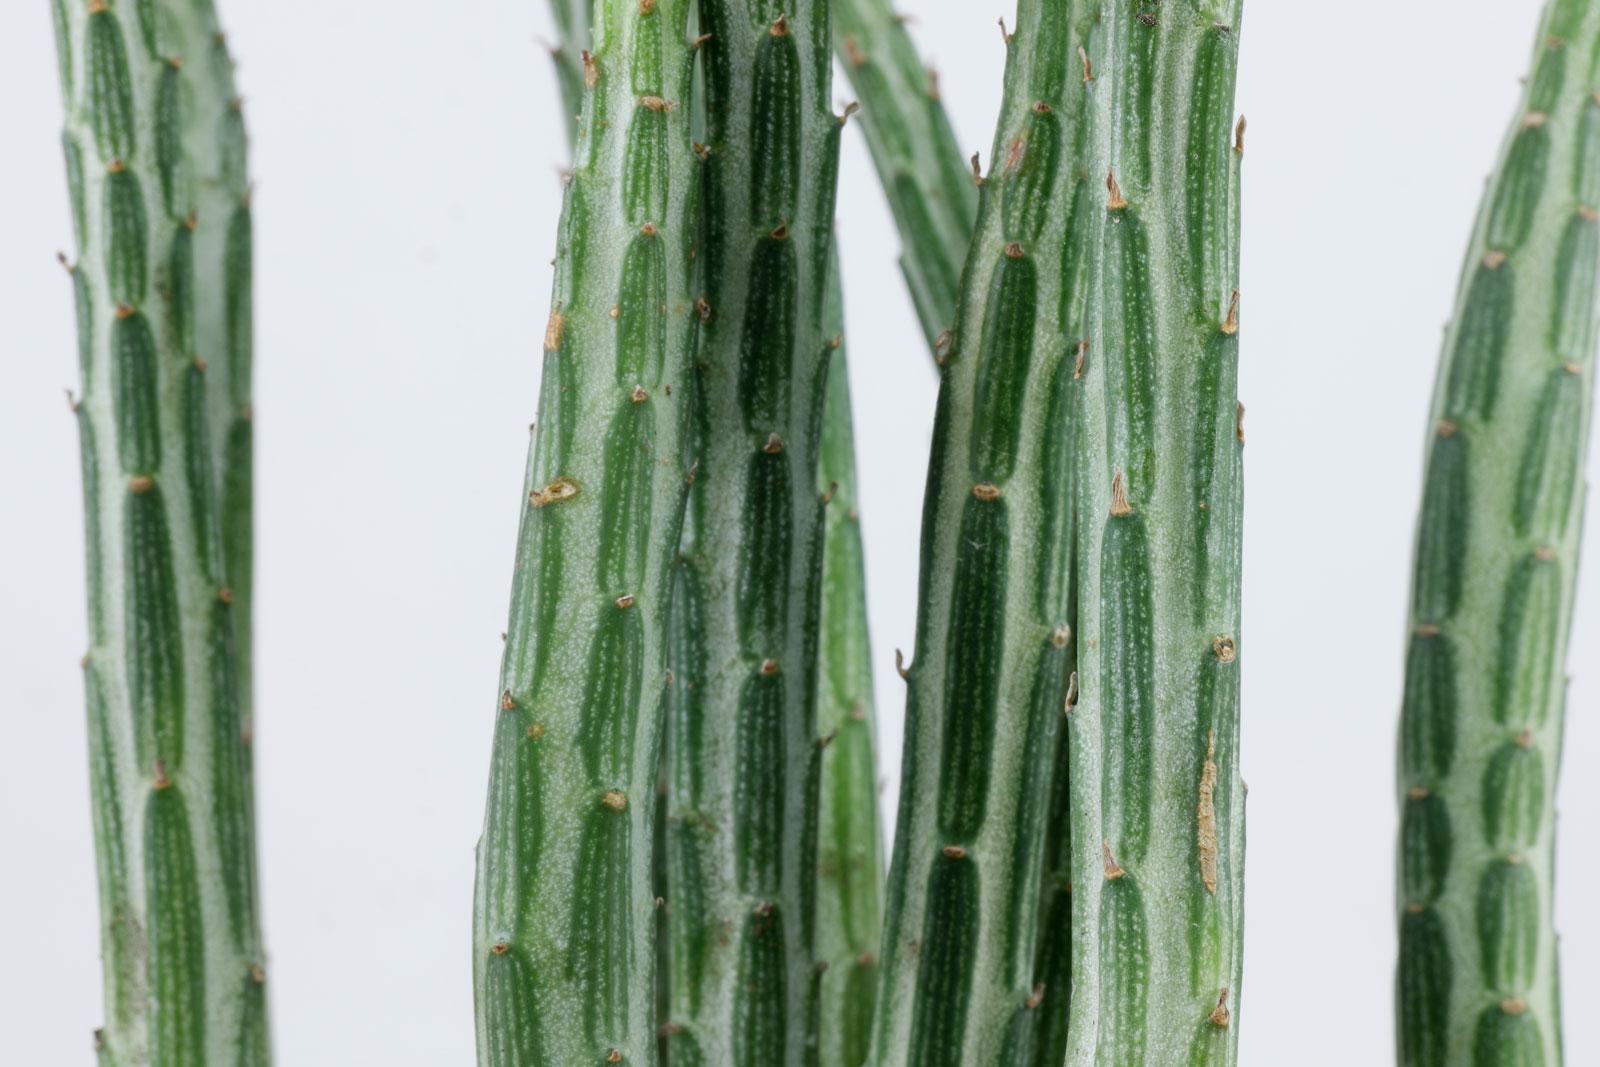 Kleinia stapeliiformis